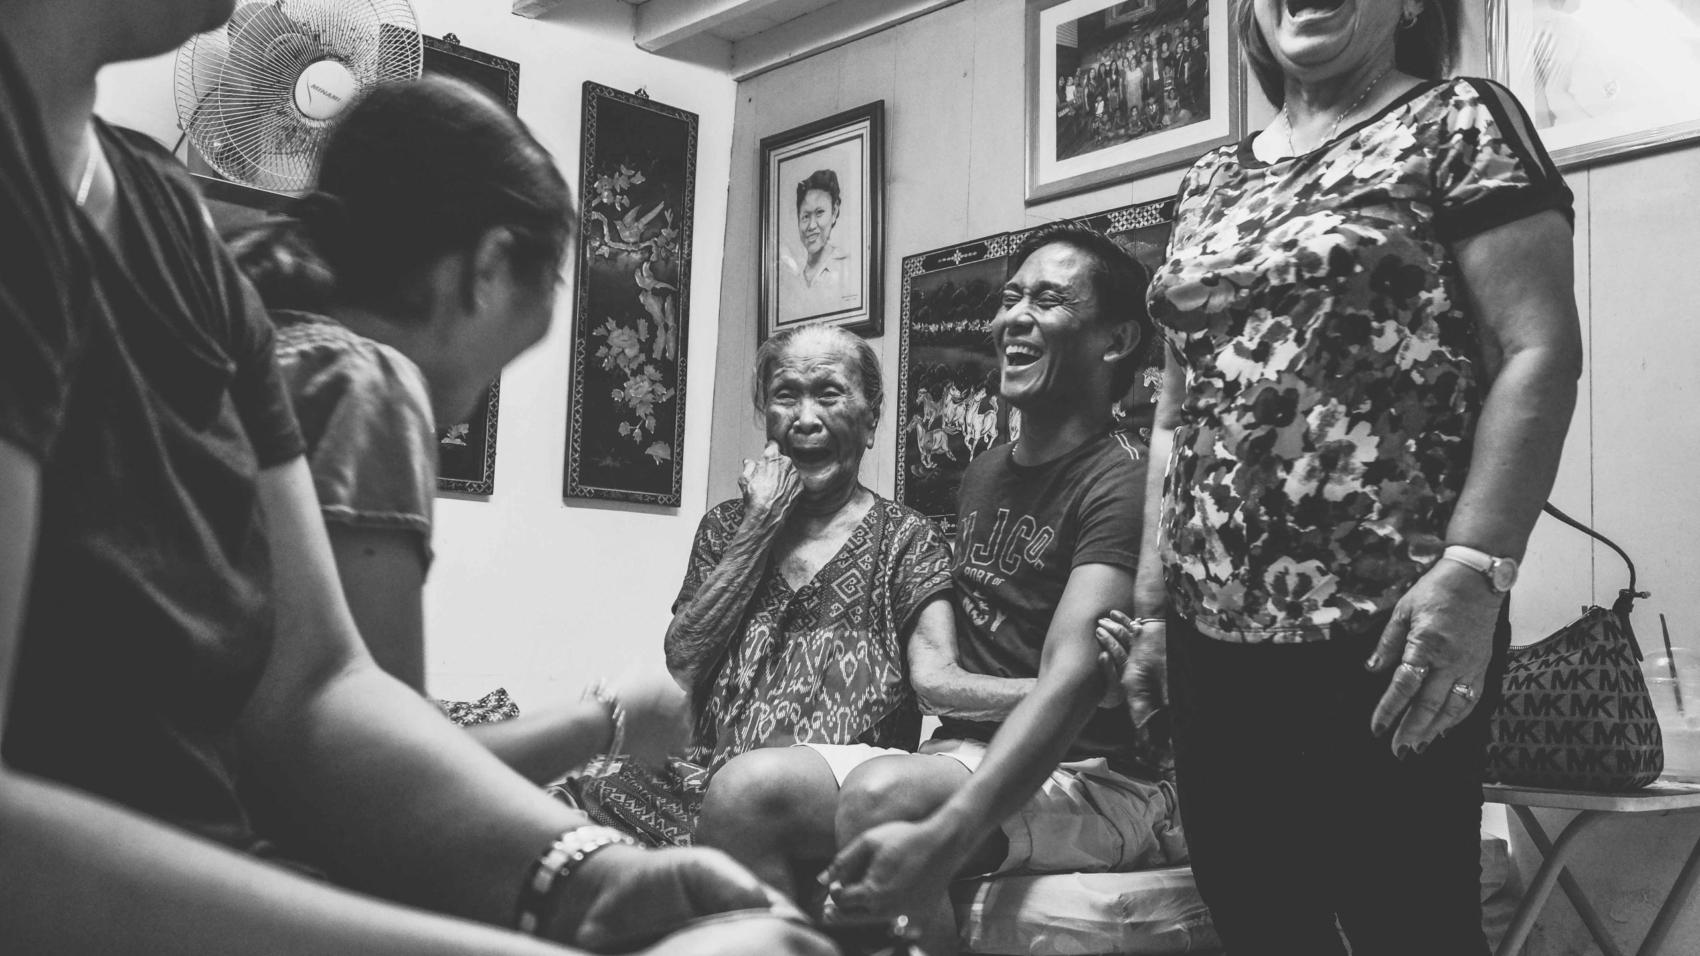 Lola Basyang - Imparting Kids the Art of Storytelling